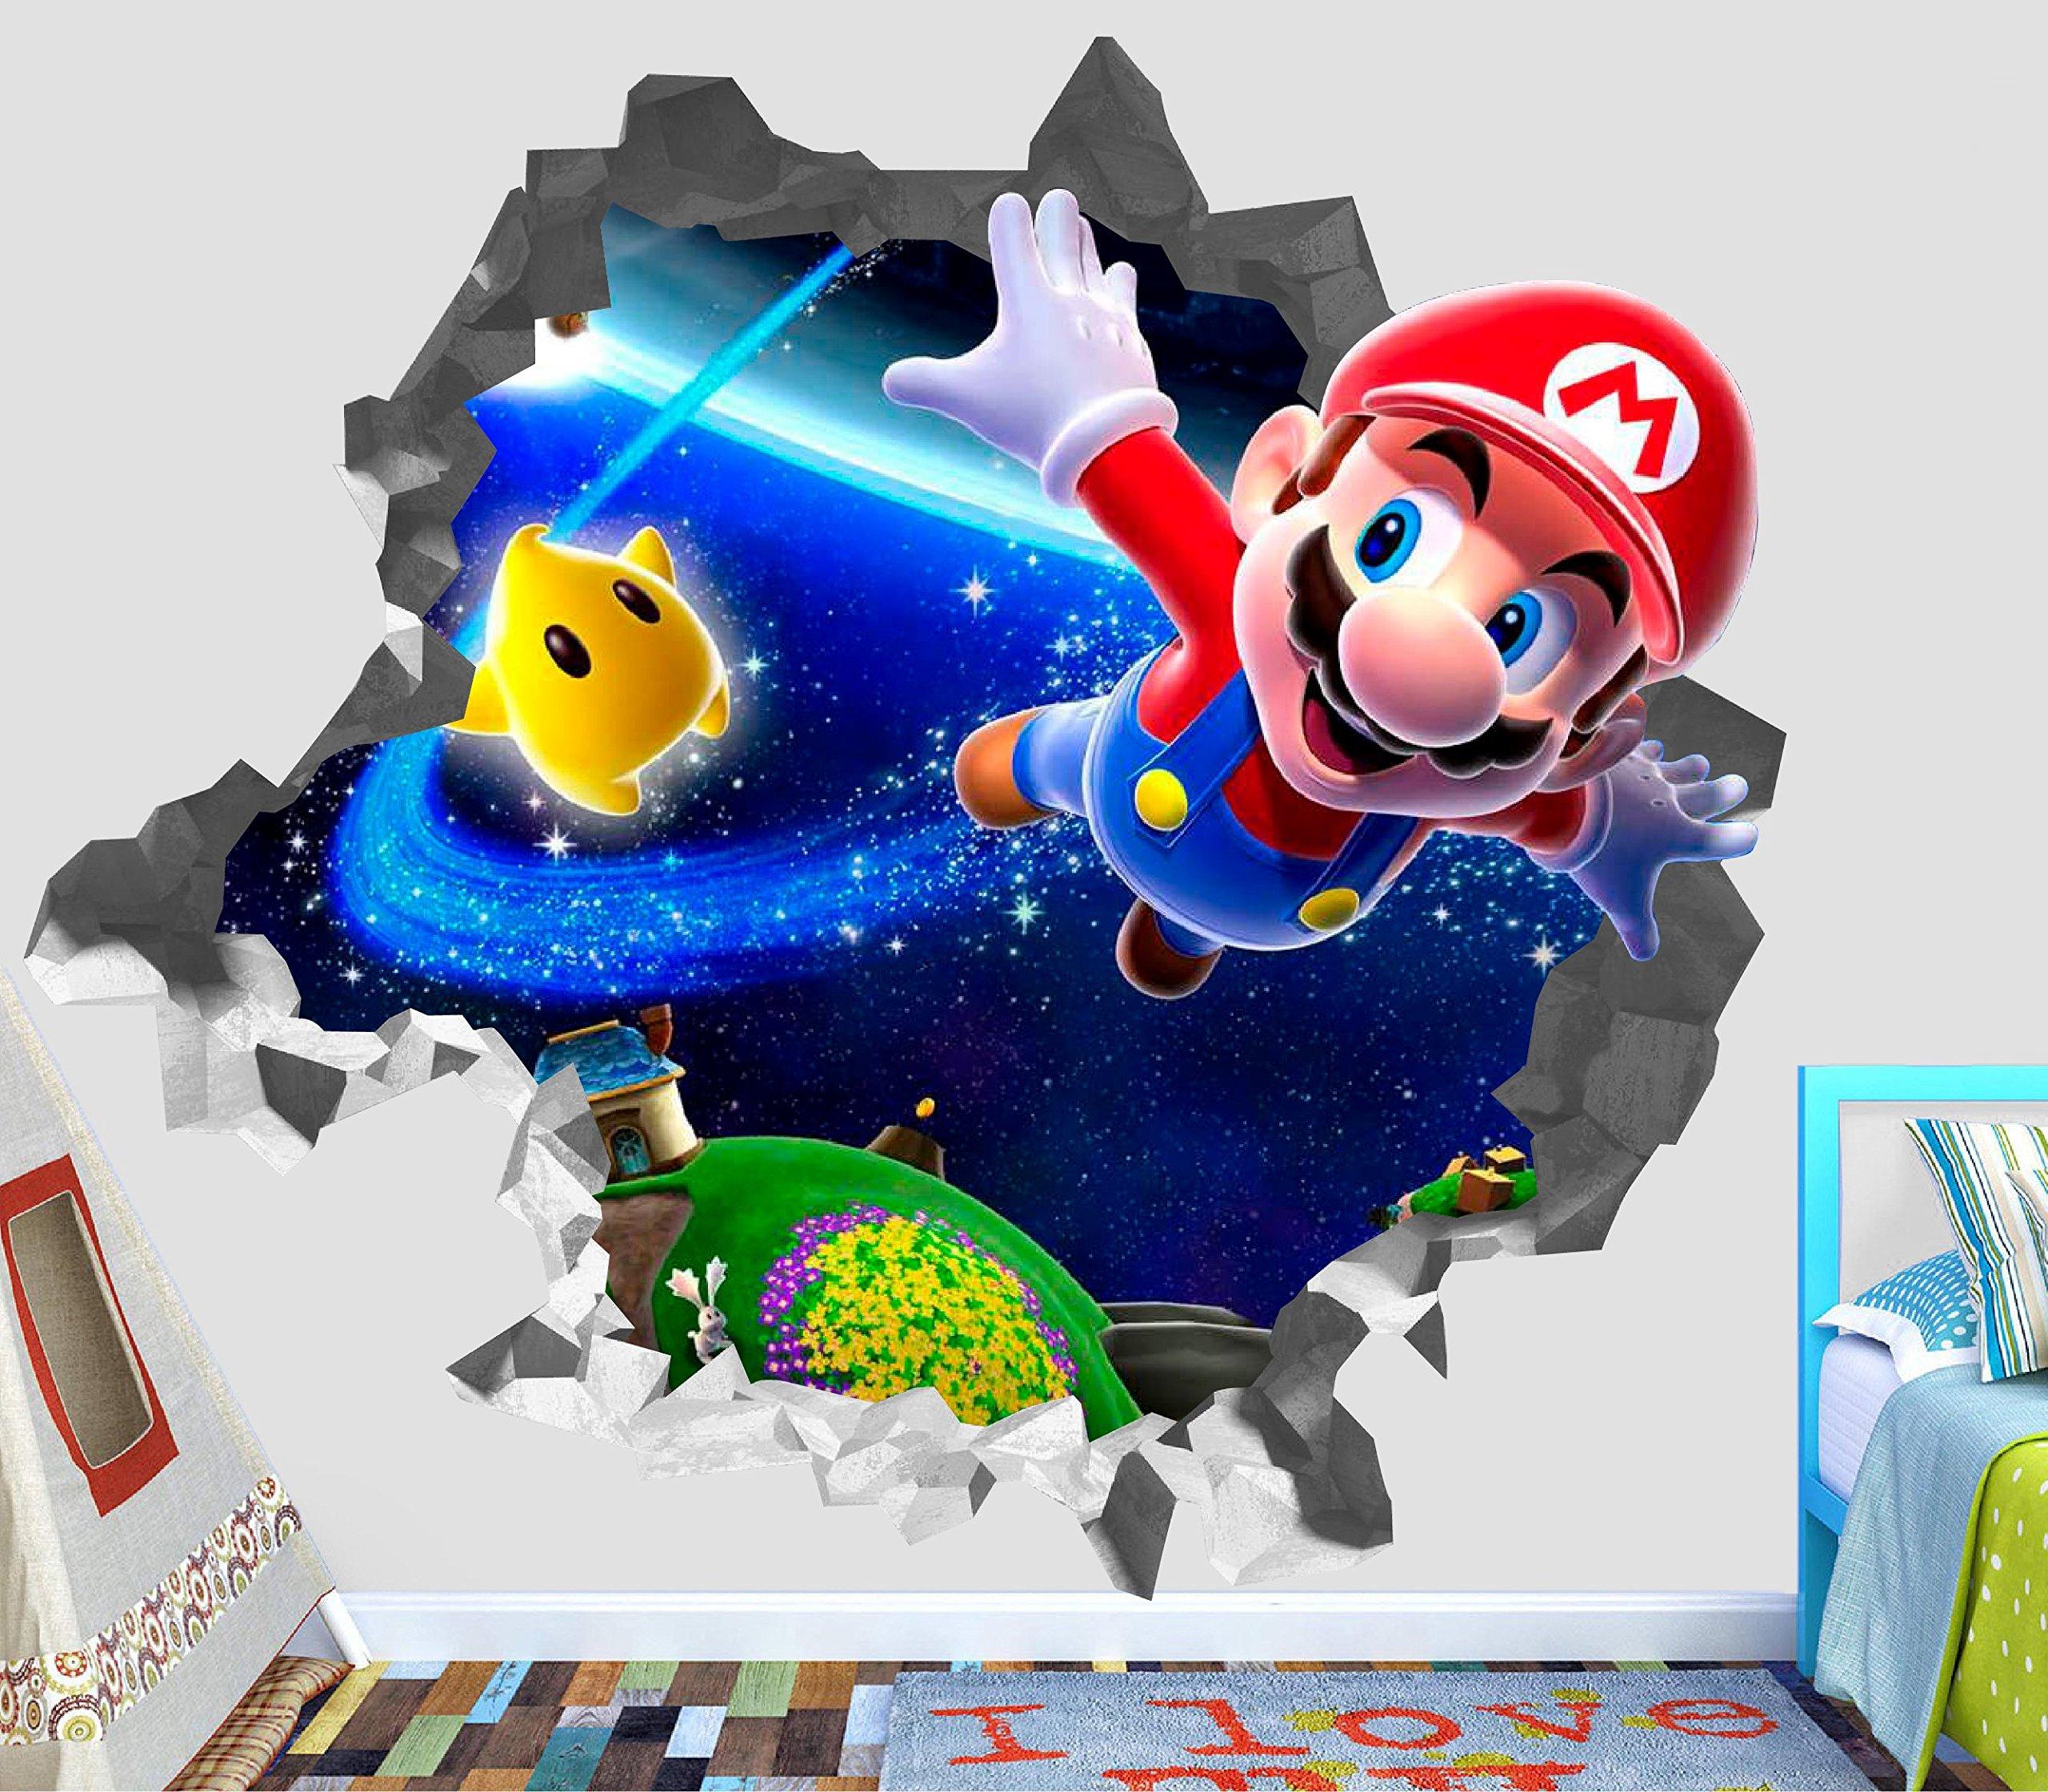 Super Mario Odyssey Adventure Wall Decal Smashed 3D Sticker Vinyl Decor Mural Games - Broken Wall - 3D Designs - OP388 (Small (Wide 22'' x 16'' Height))